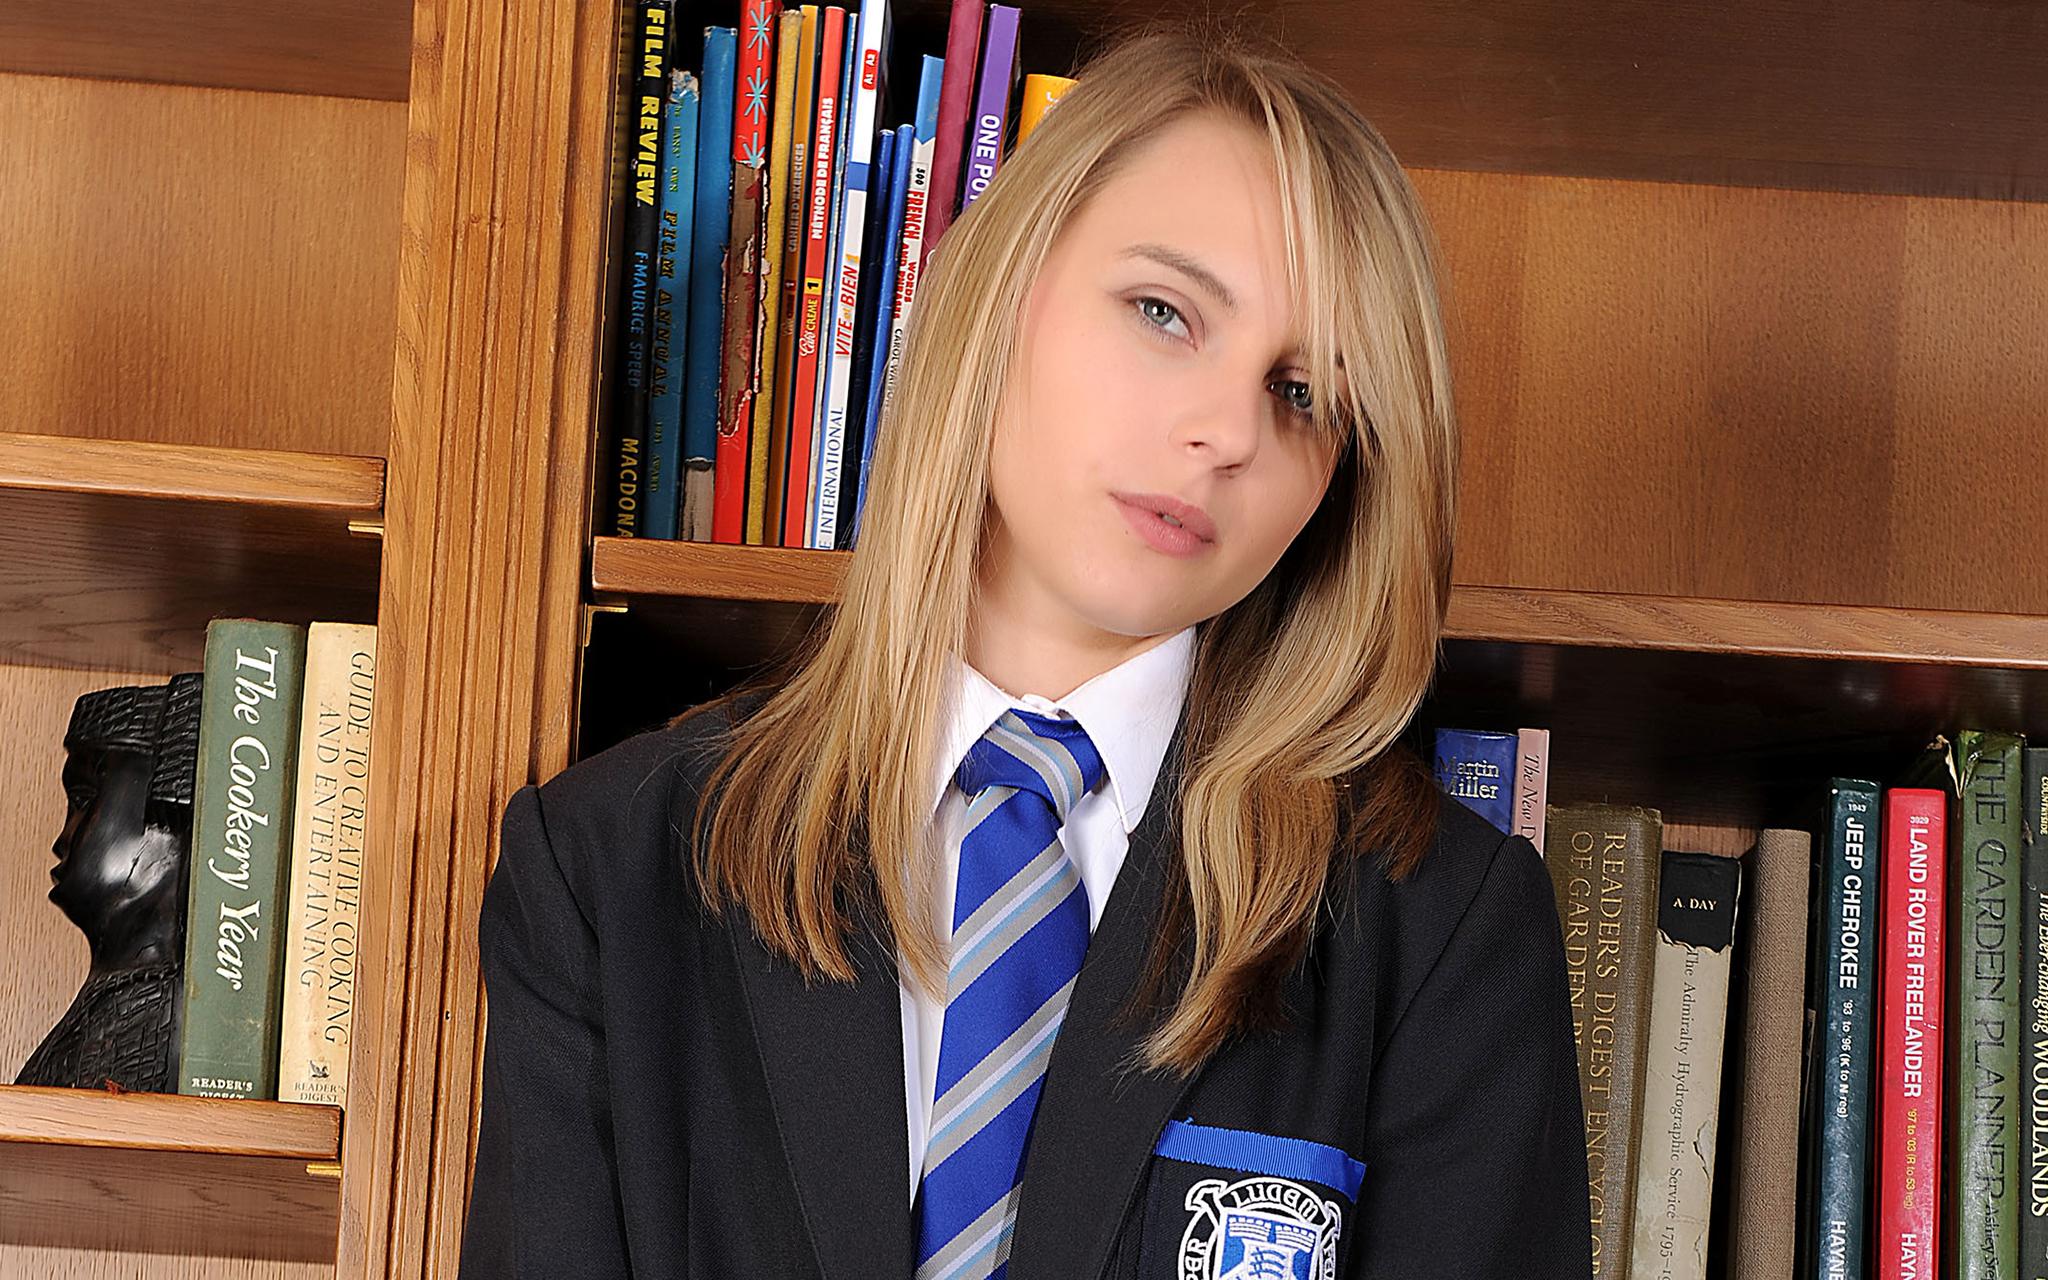 Chloe Toy Blonde Women School Uniform Face Tie Women Indoors